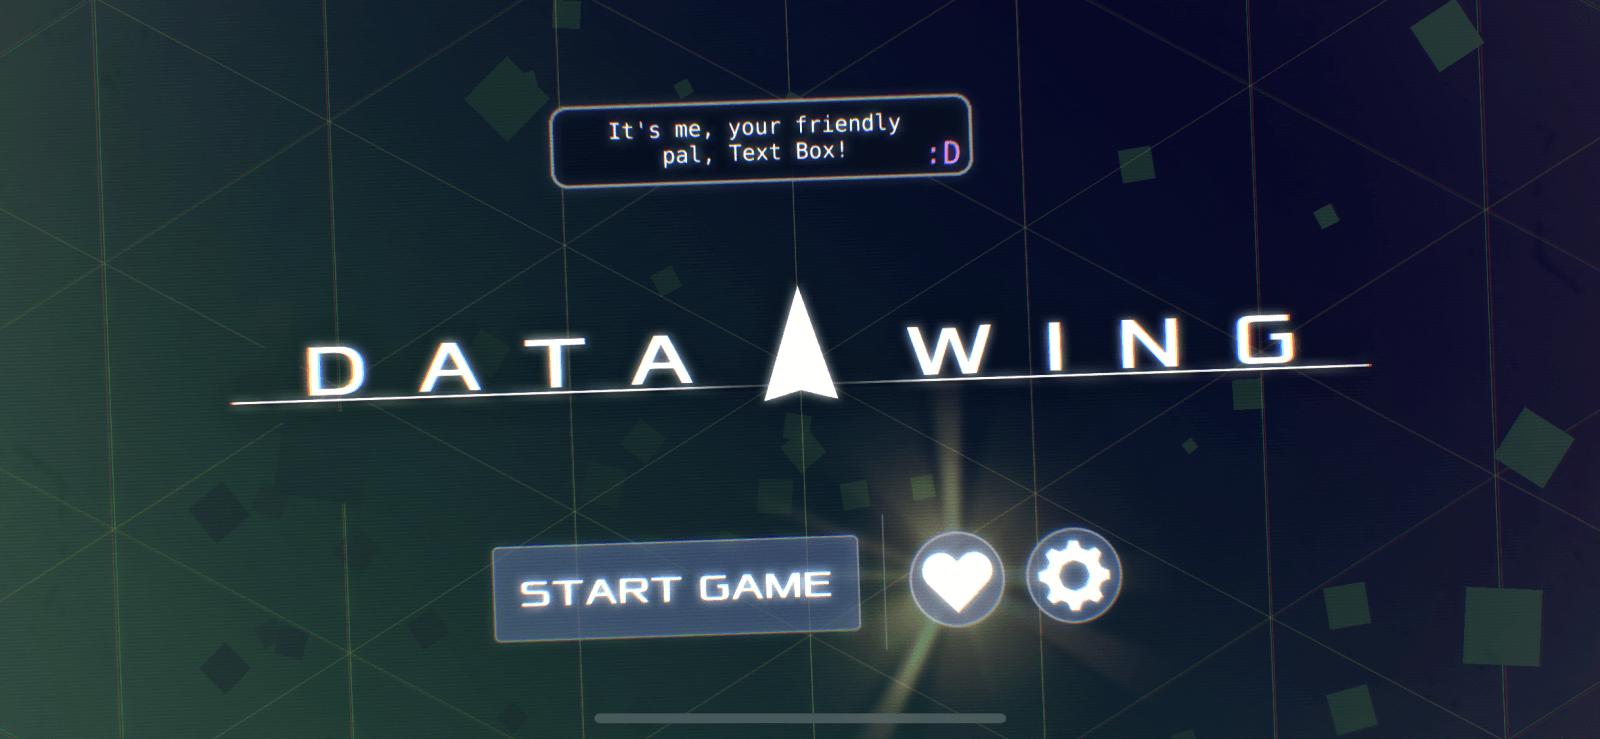 Data Wing